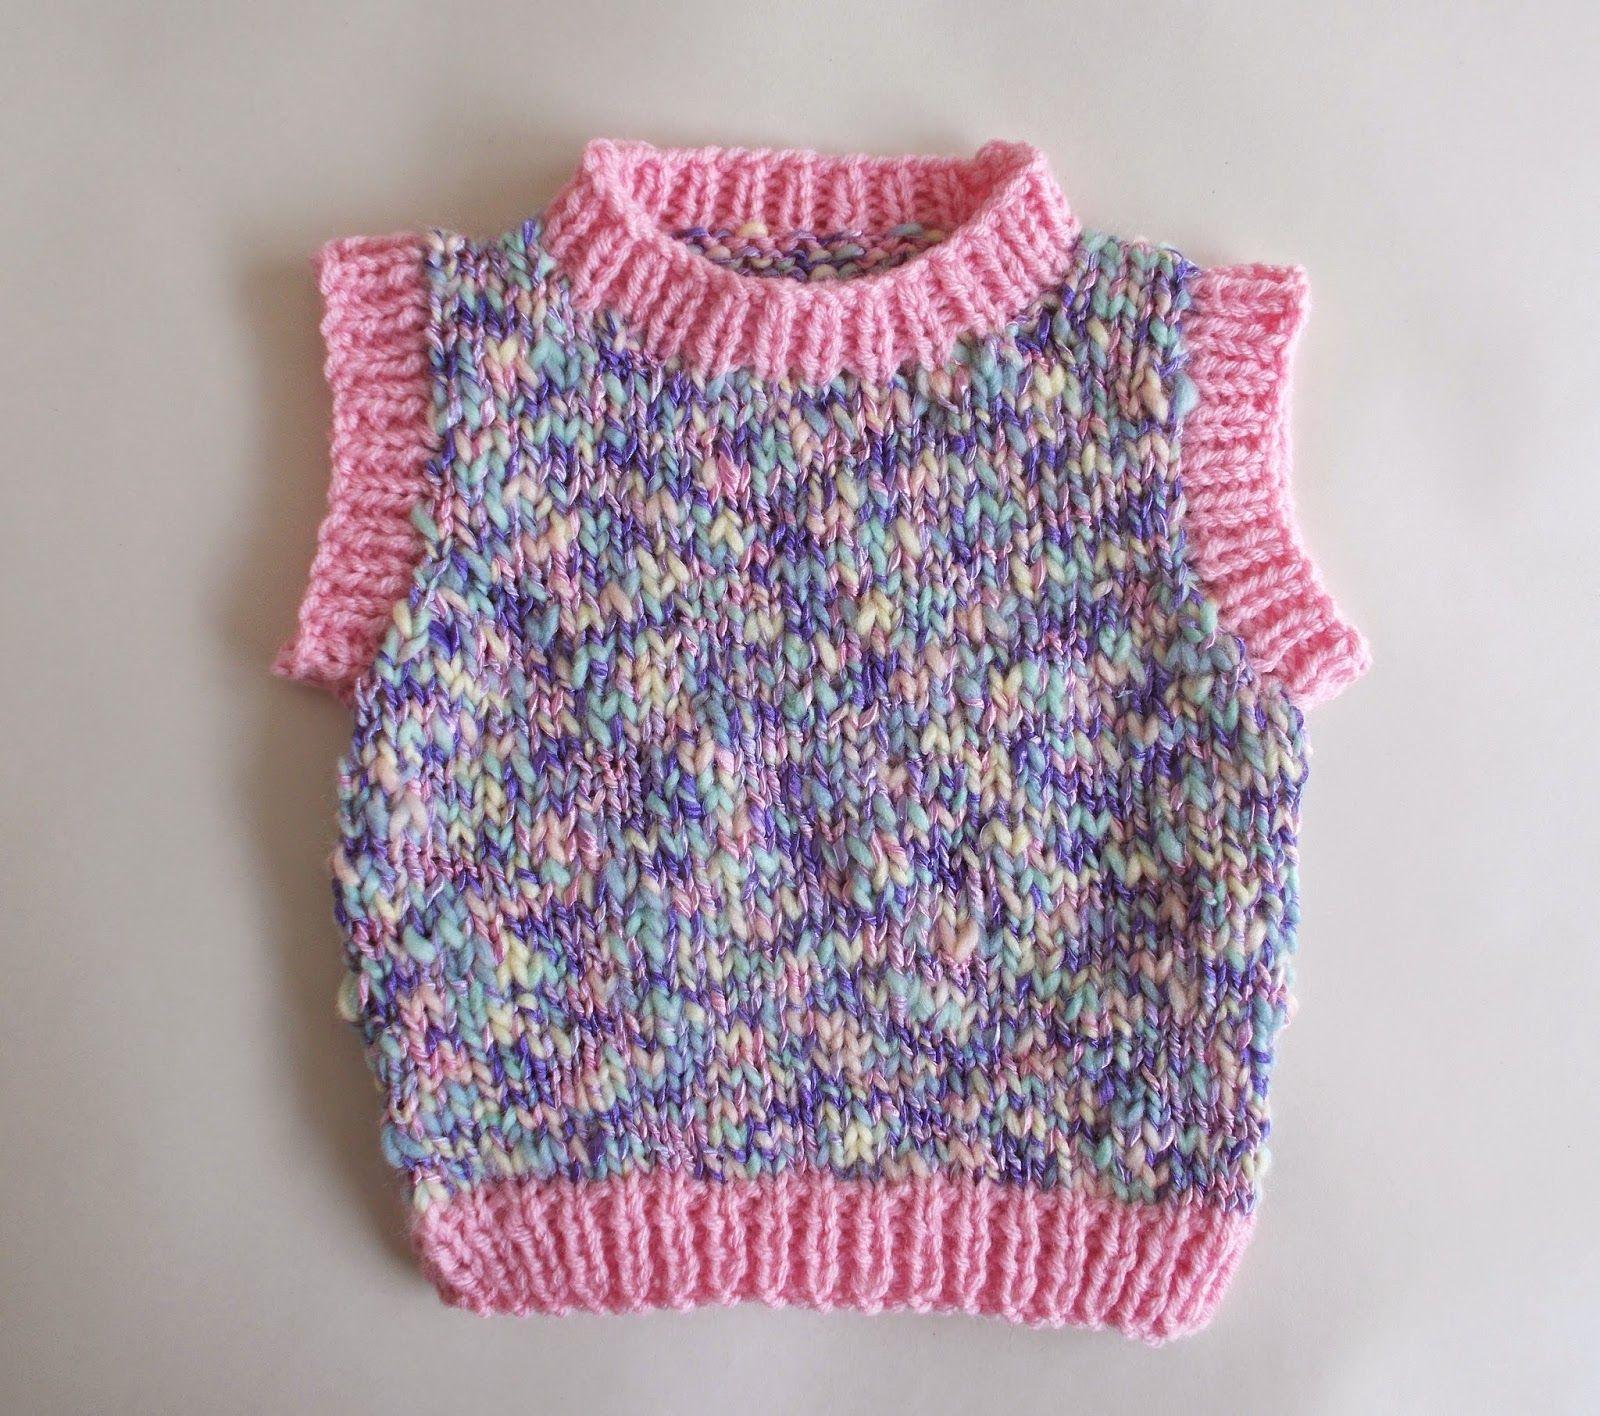 Moiselle chunky yarn sleeveless baby vest top (marianna\'s lazy daisy ...